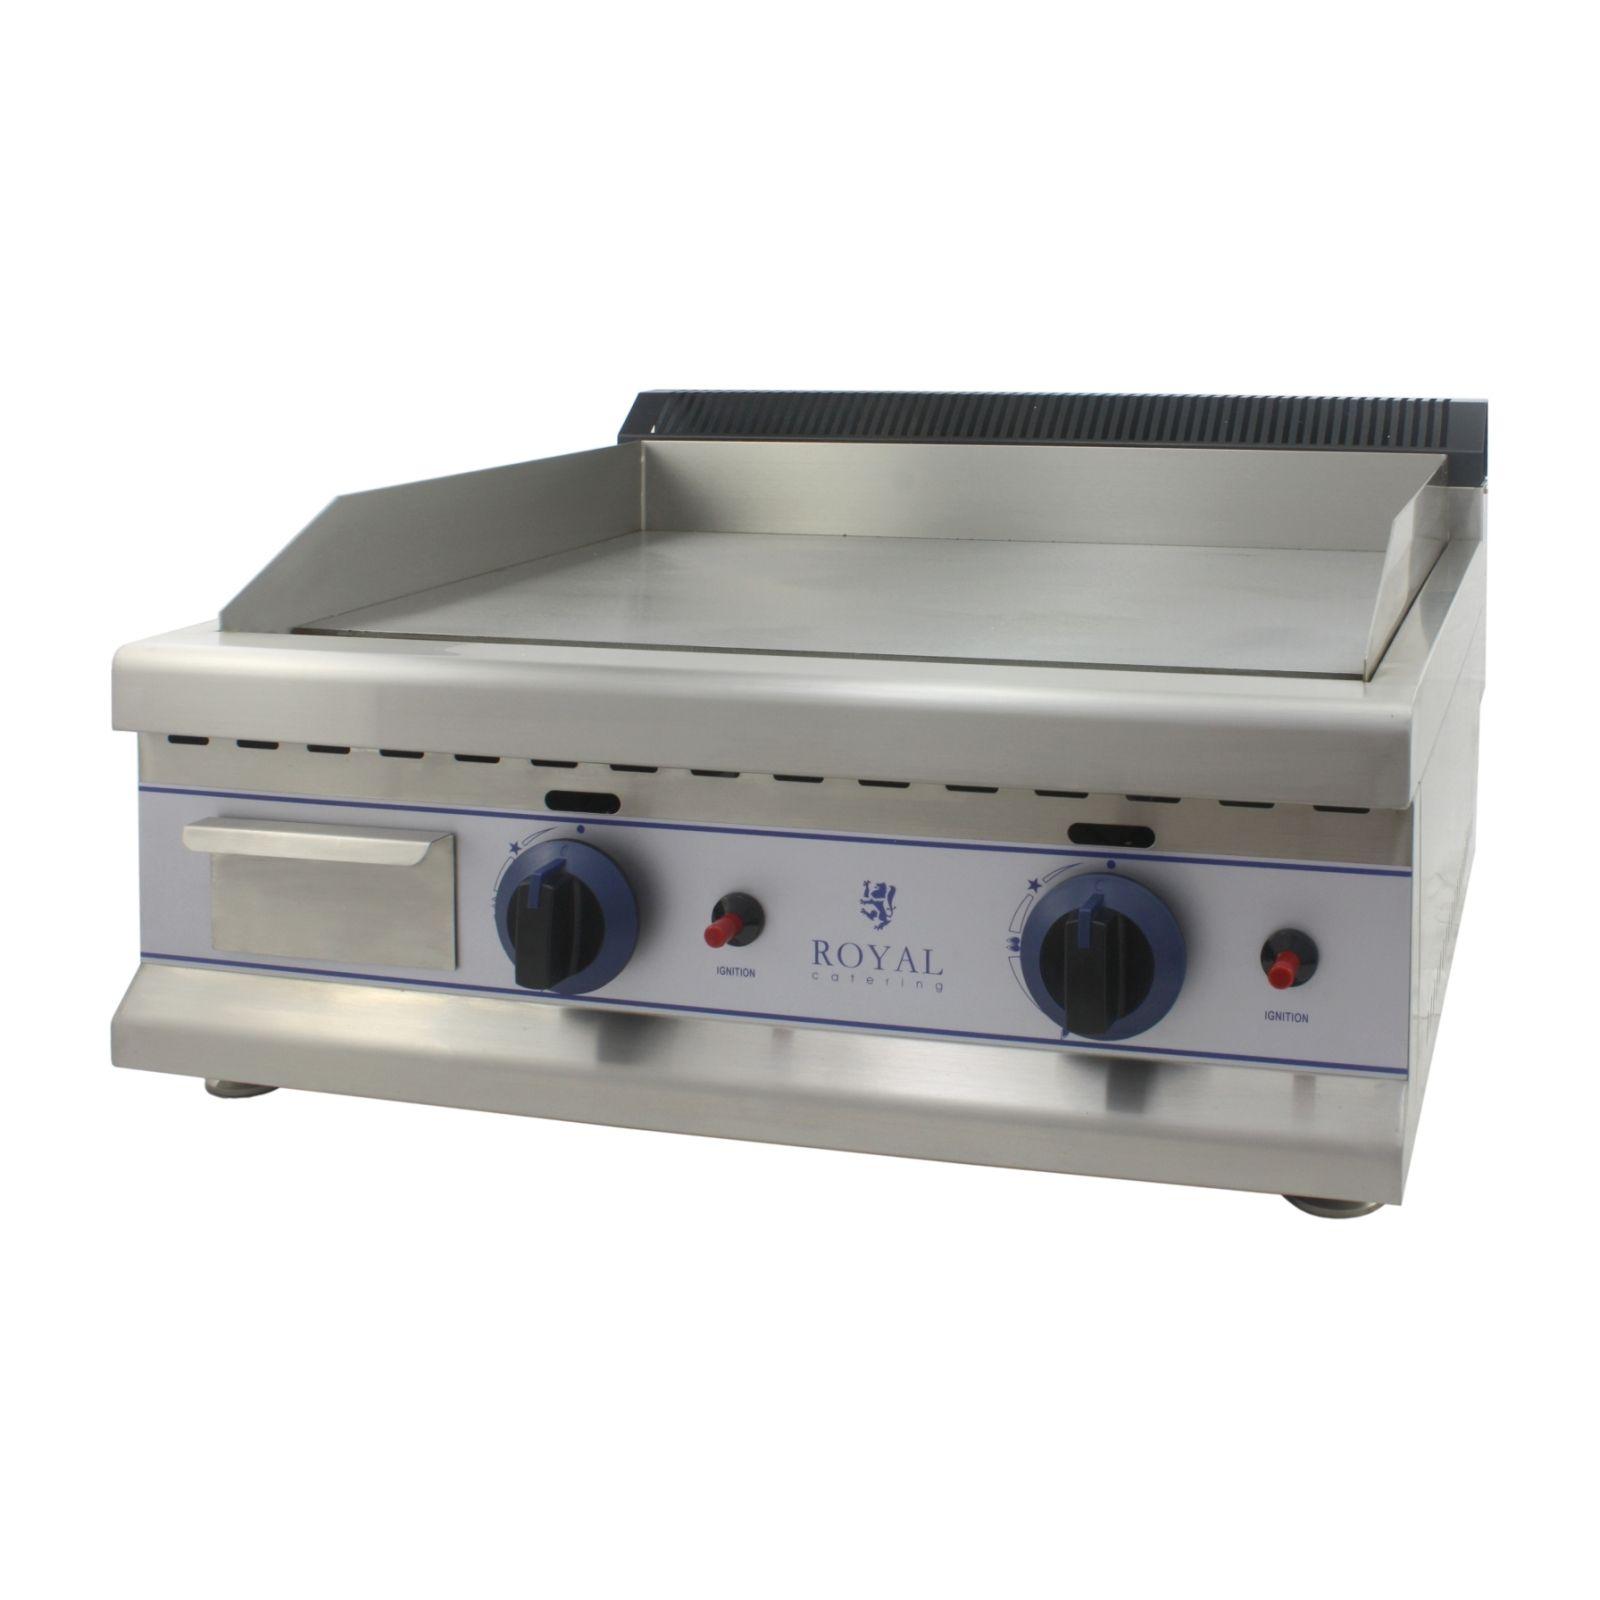 royal catering fry top a gas da banco - 65 cm - propano/butano 30 mbar rcgl 65l30h